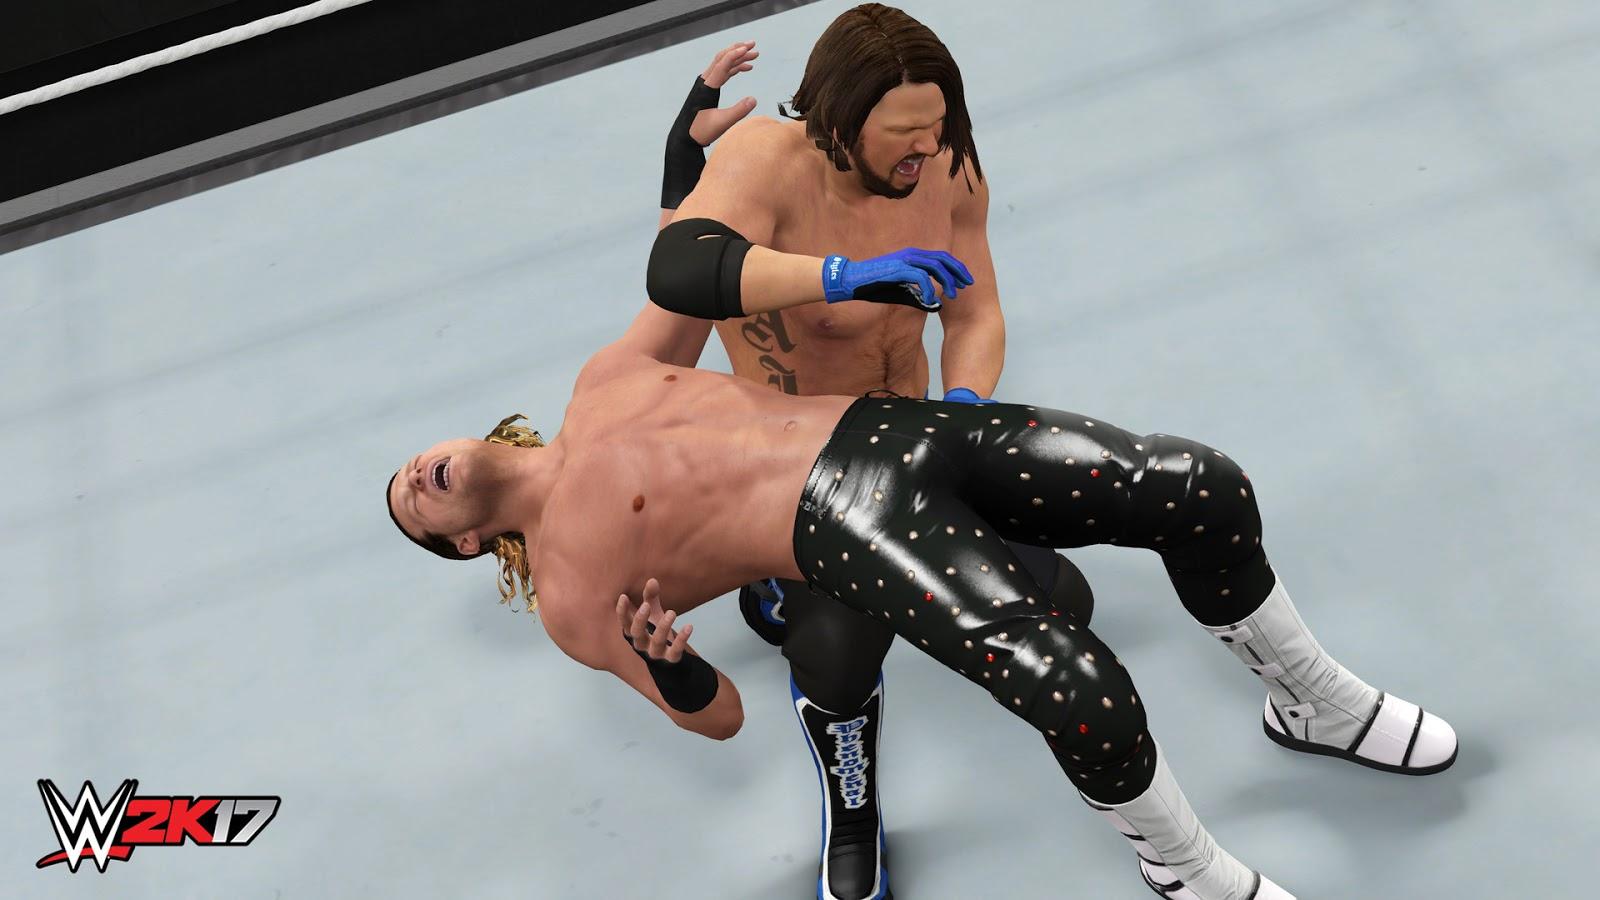 WWE 2K17 ESPAÑOL PC Descargar Full (CODEX) + REPACK 10 DVD5 (JPW) 7